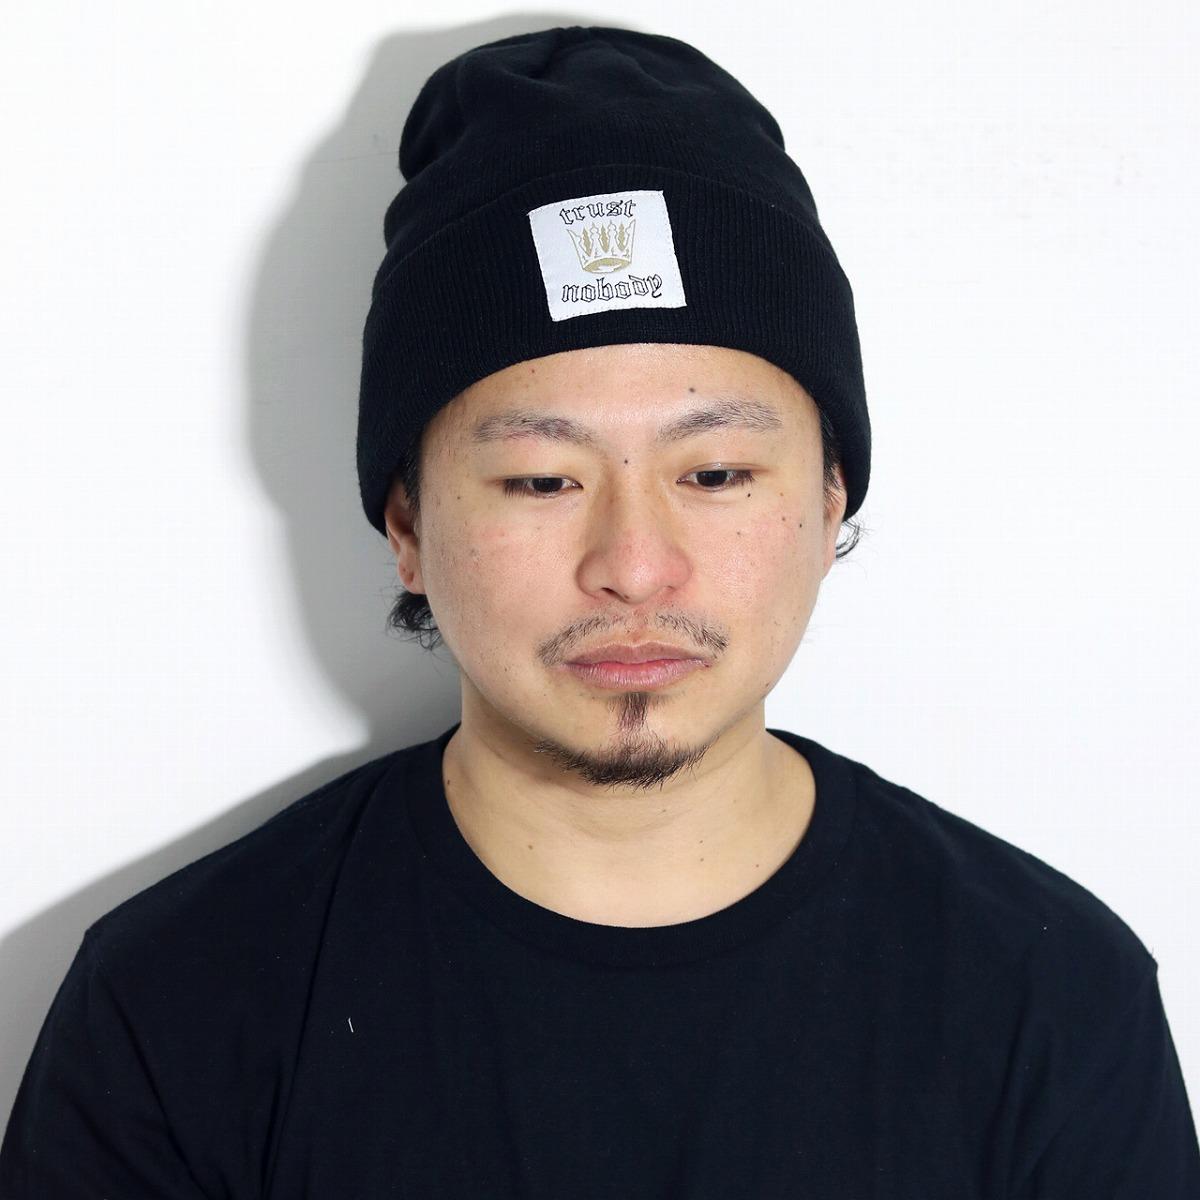 54090121e42 ELEHELM HAT STORE  I present it in knit hat cool hat toe pack ...